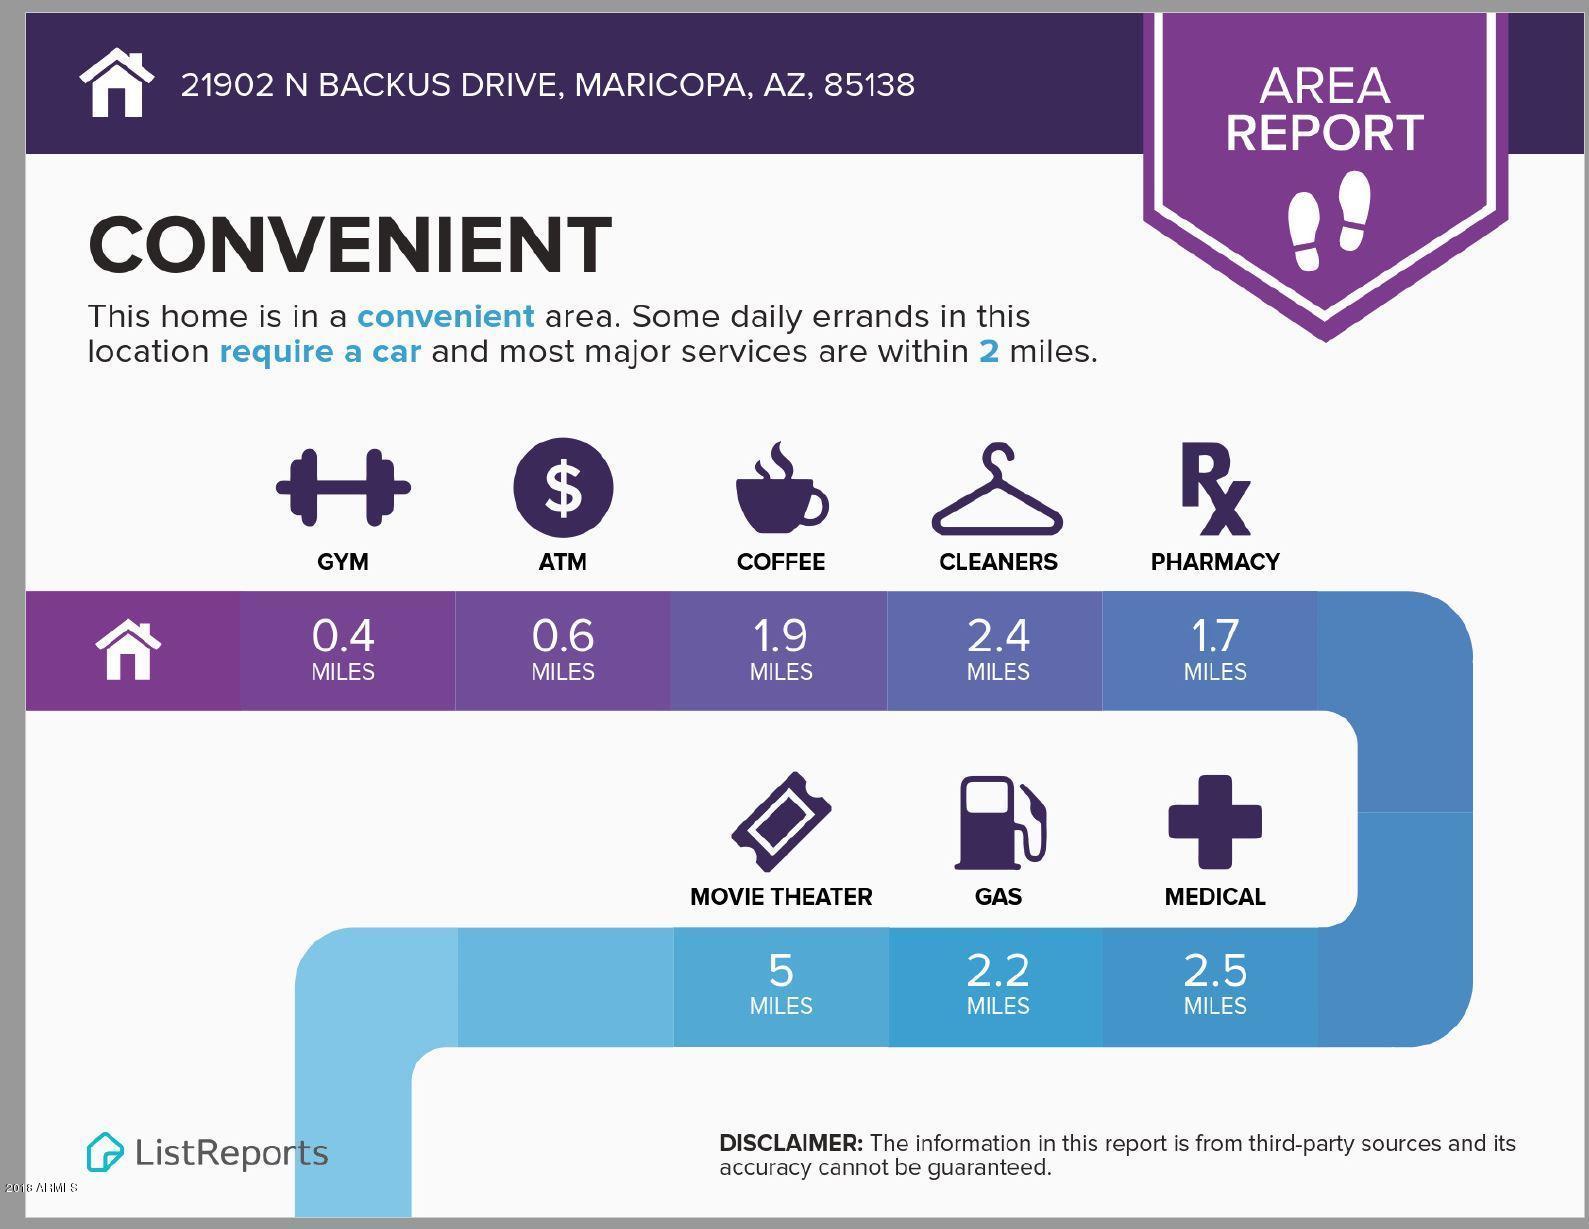 21902 N BACKUS Drive Maricopa, AZ 85138 - MLS #: 5800486